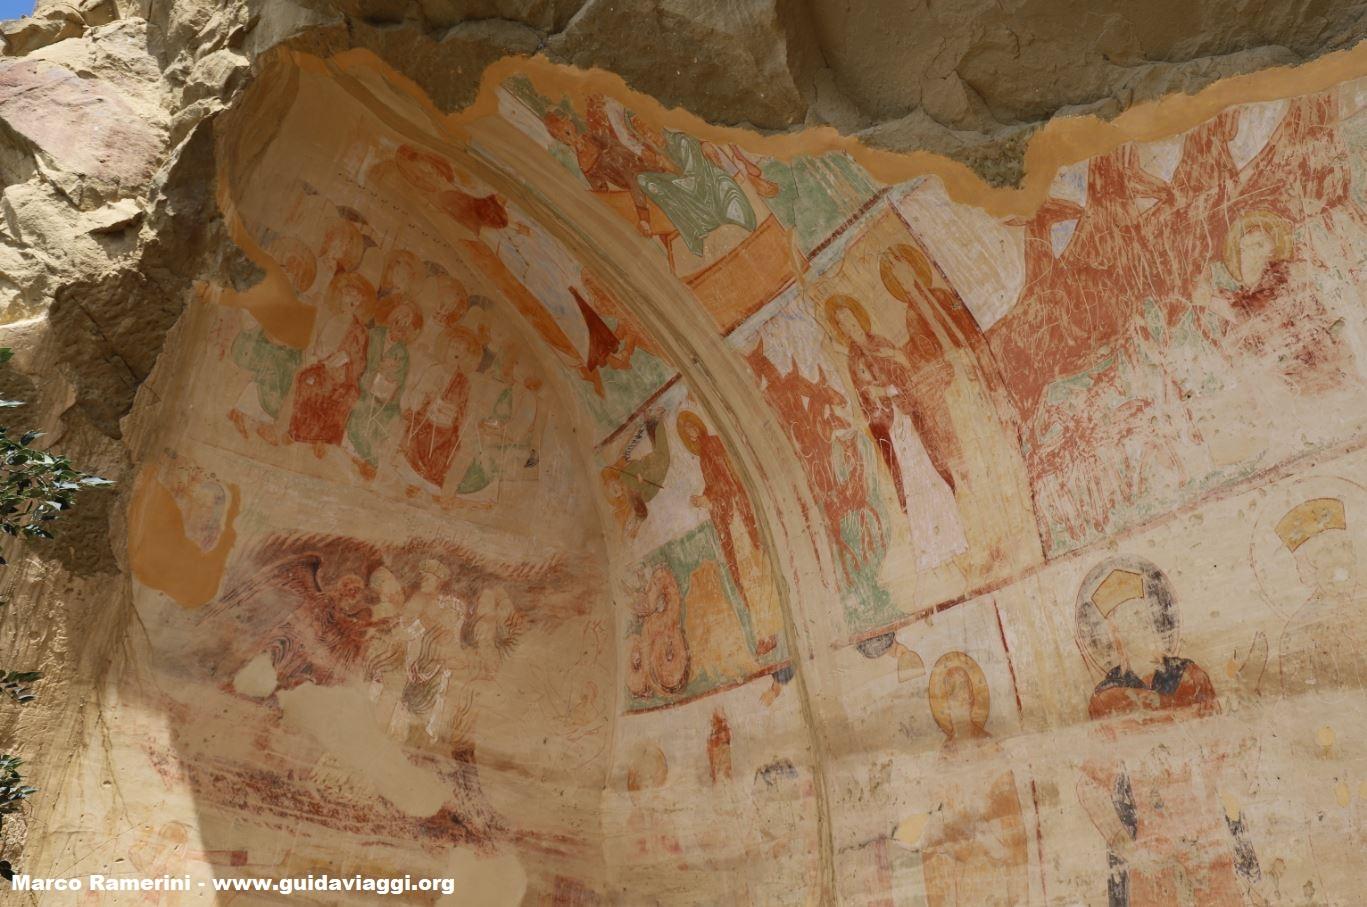 Affreschi nelle grotte, Davit Gareja, Georgia. Autore e Copyright Marco Ramerini